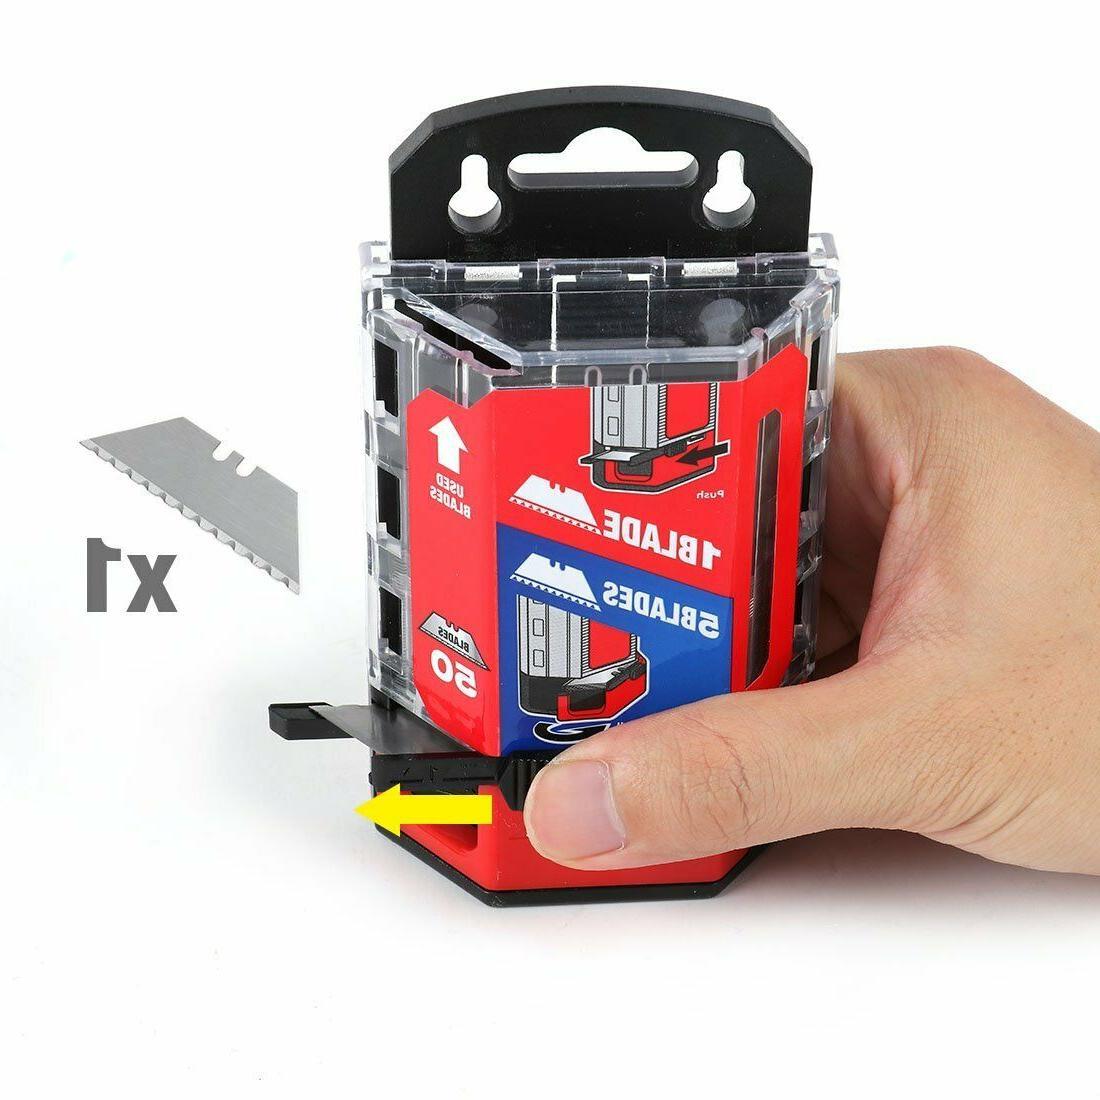 WORKPRO Dispenser SK5 Steel